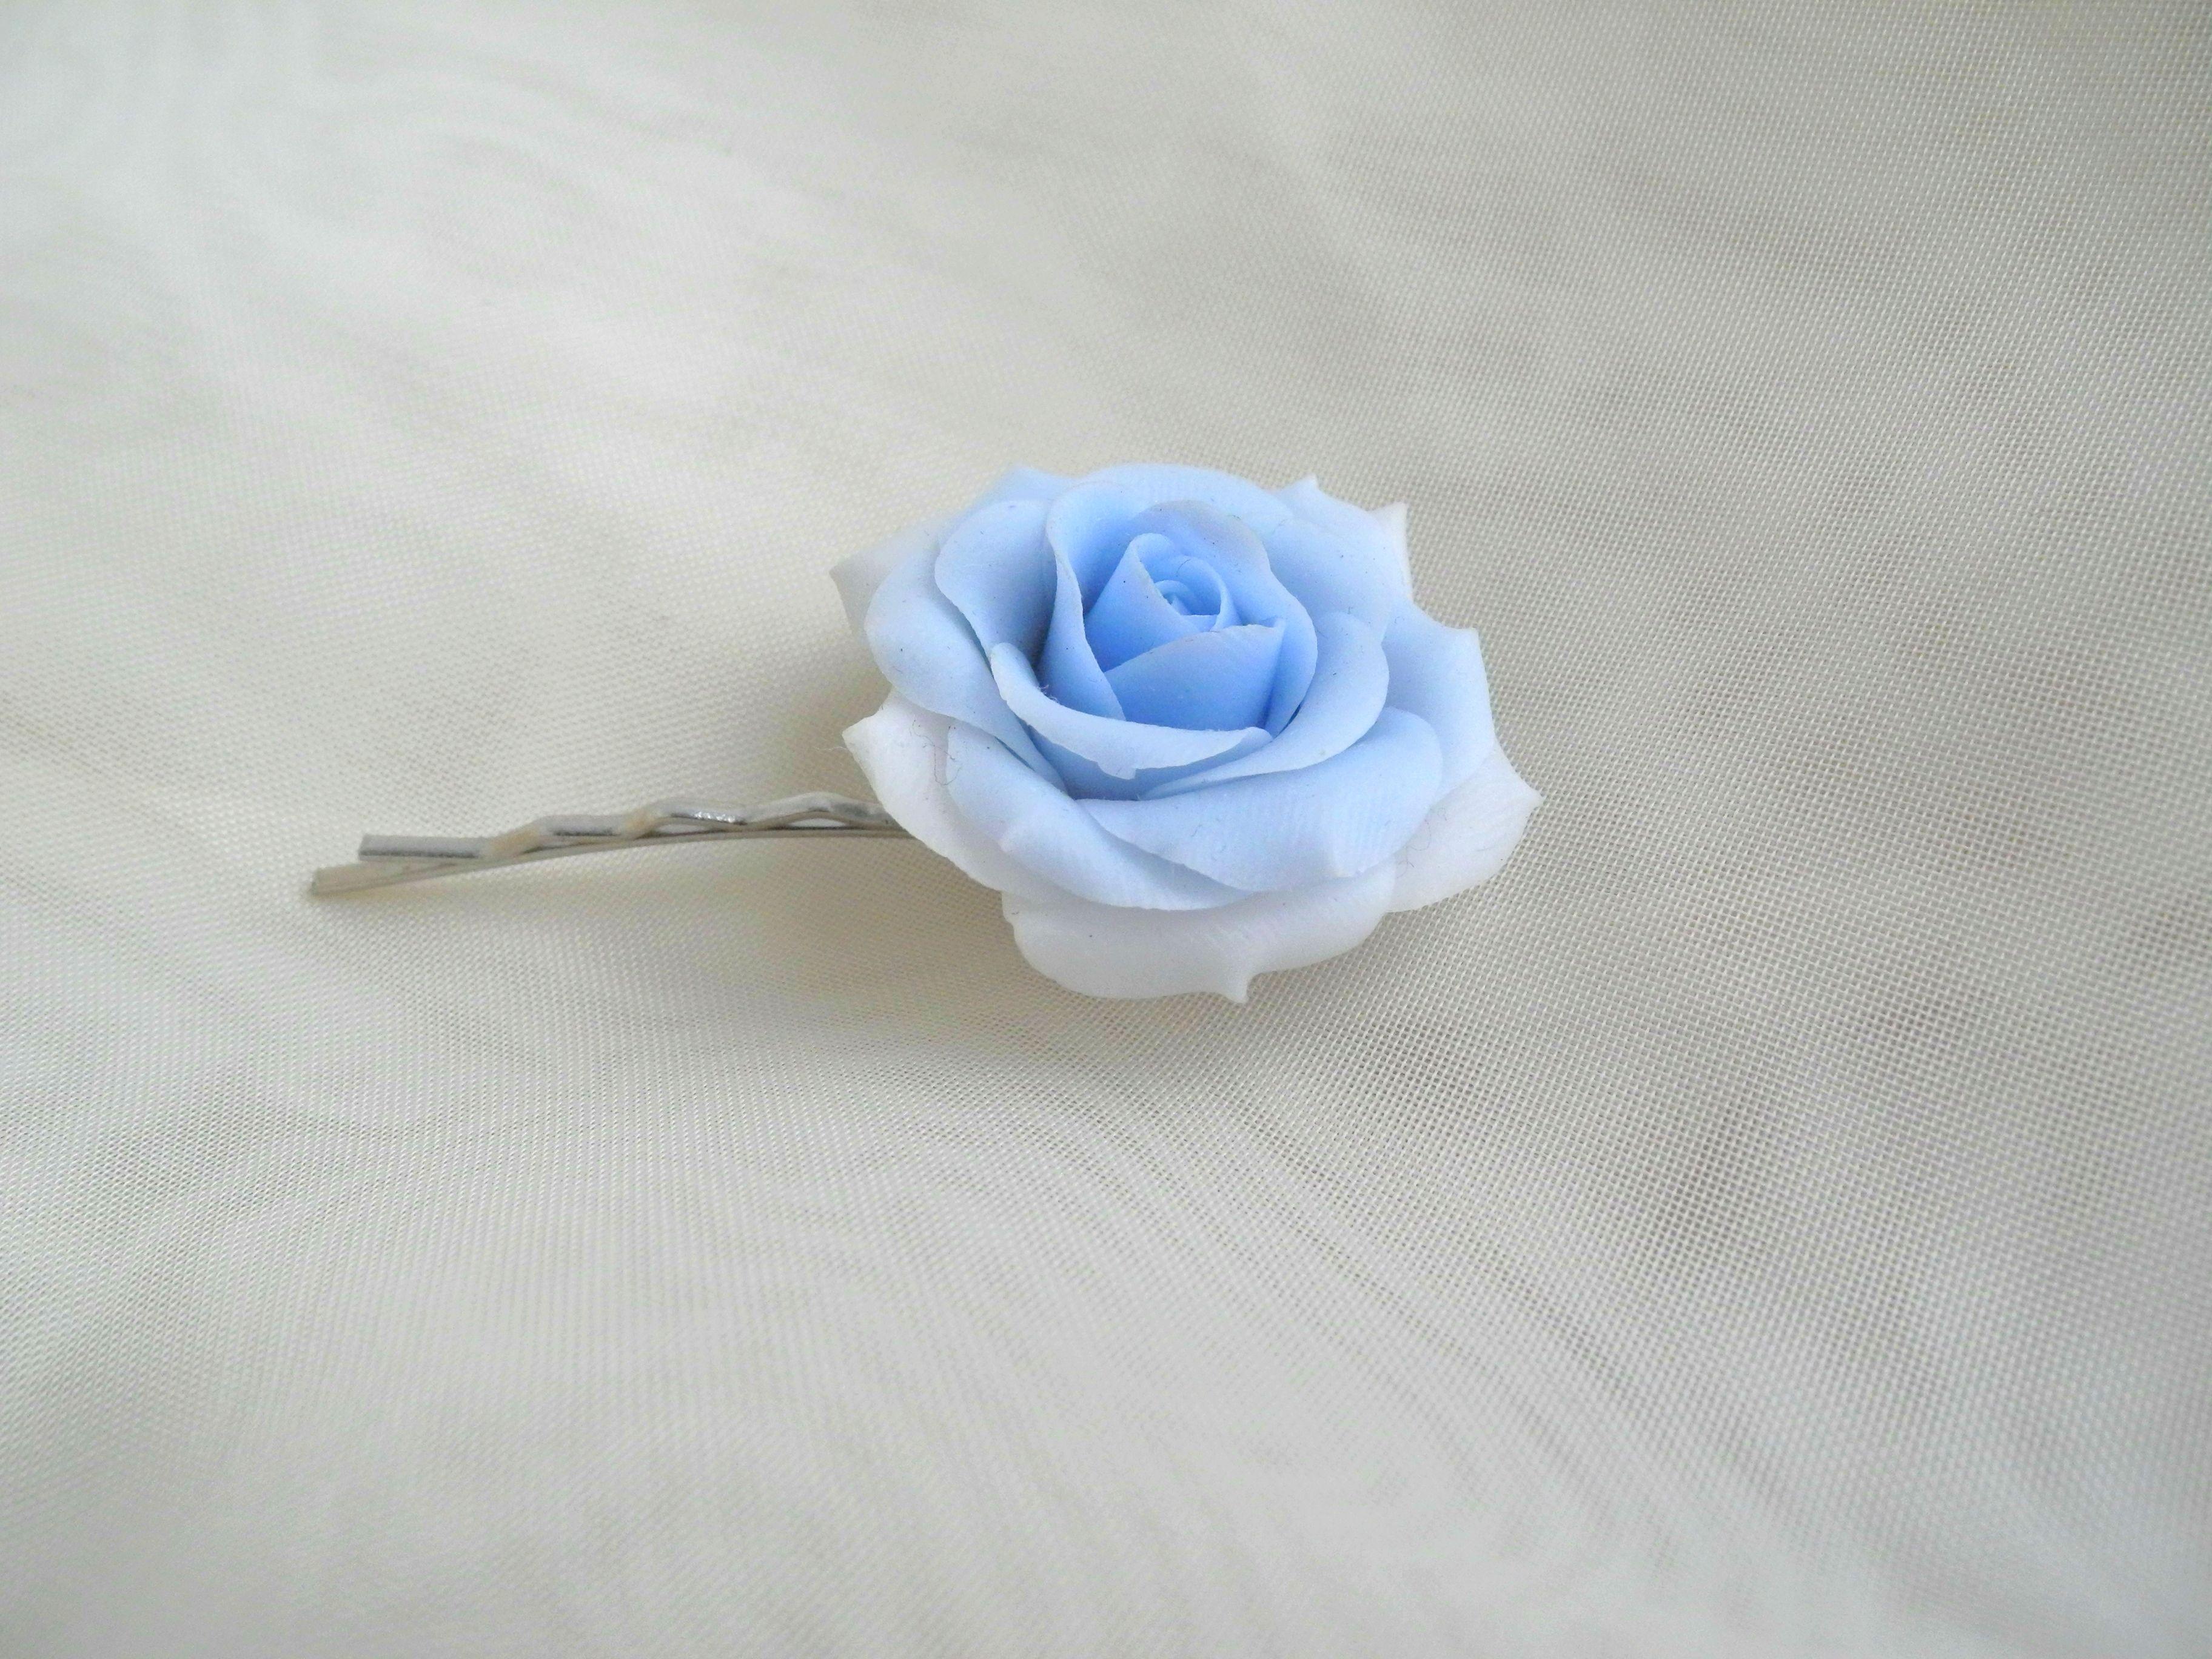 handmade handmadegift rose flowers hairpin bobbypin bijou coldporcelain ceramic